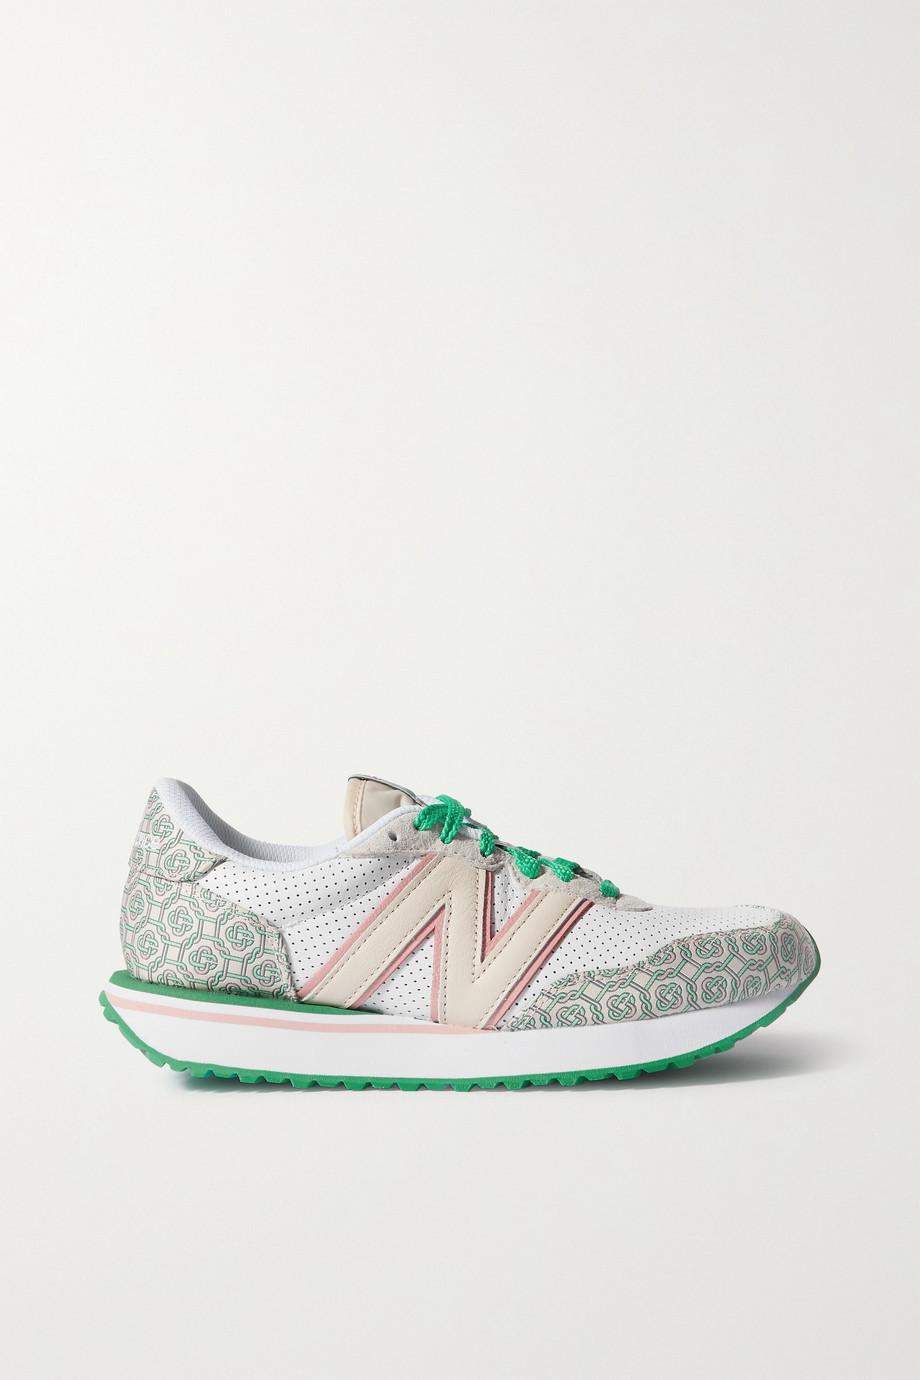 New Balance + Casablanca 238 Sneakers aus Leder, Jacquard mit Logomuster und Veloursleder